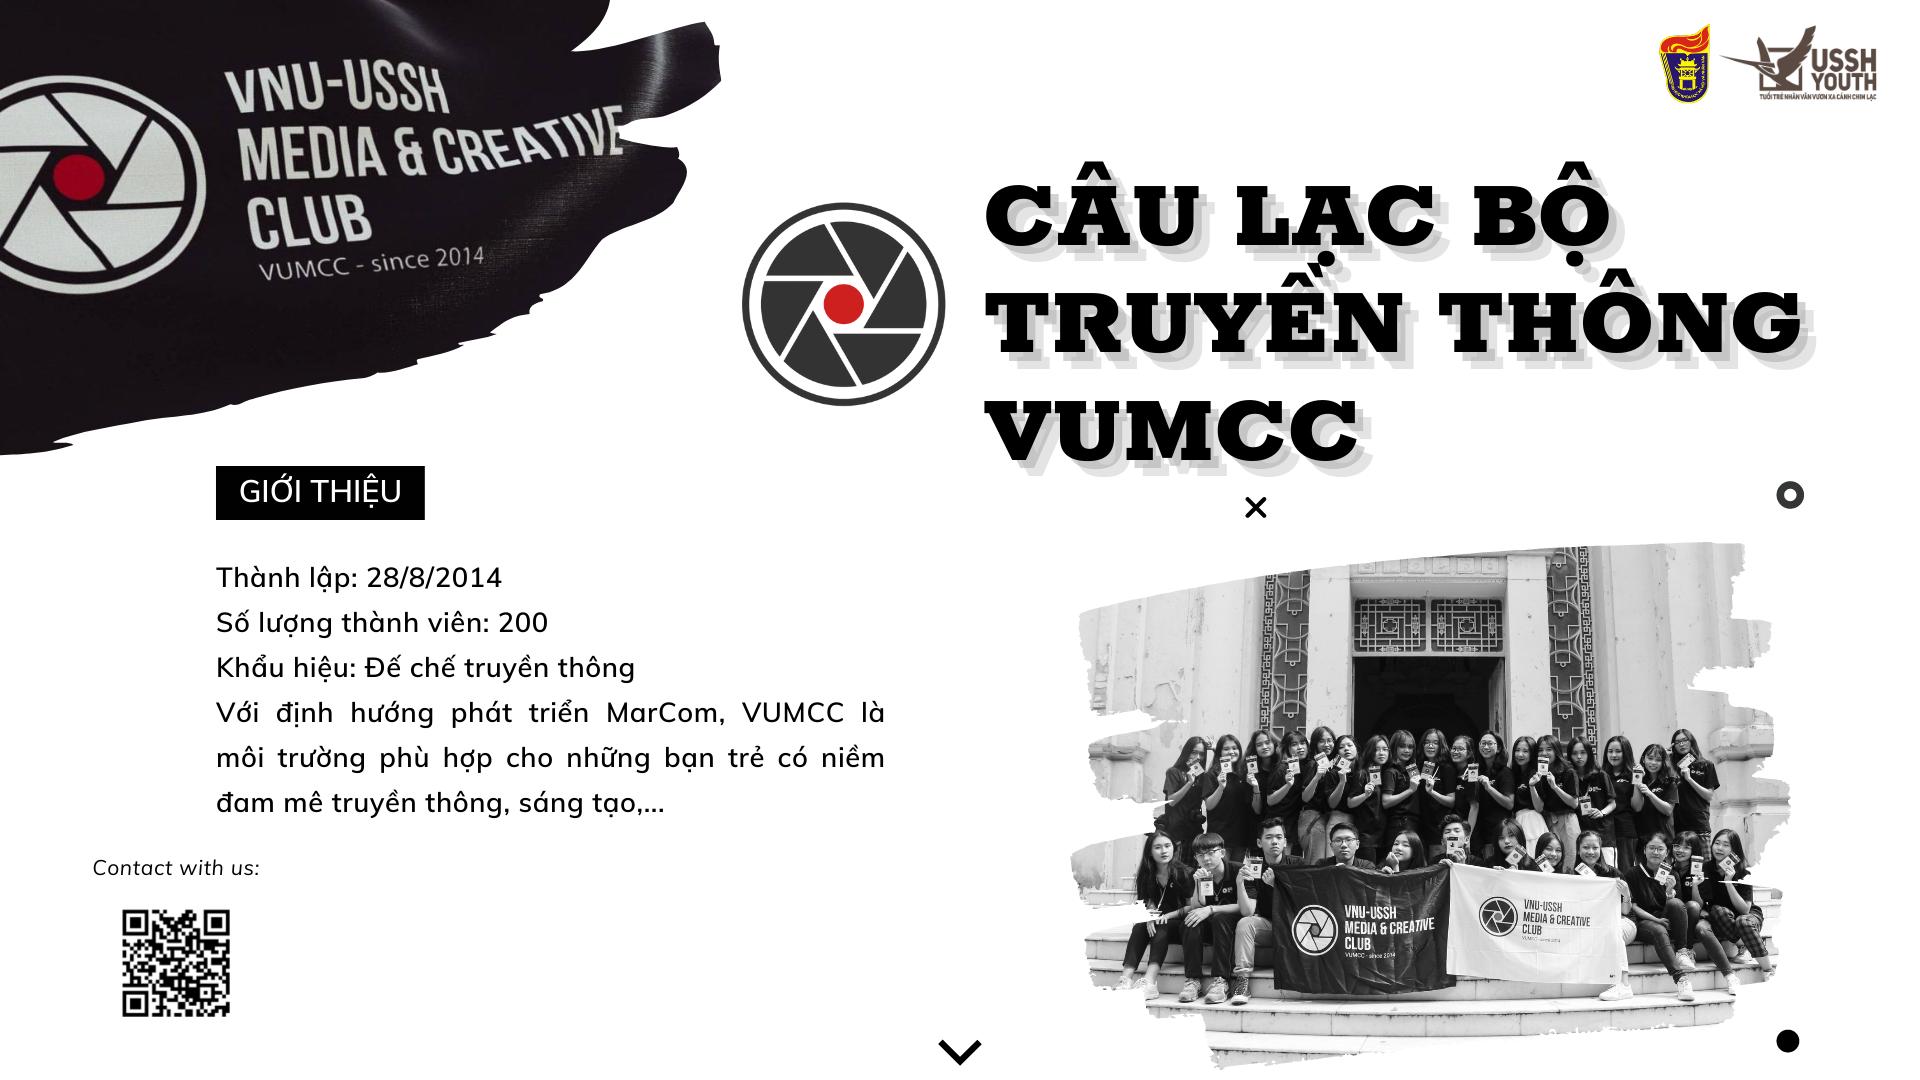 CLB TRUYß+ÇN TH+öNG VUMCC